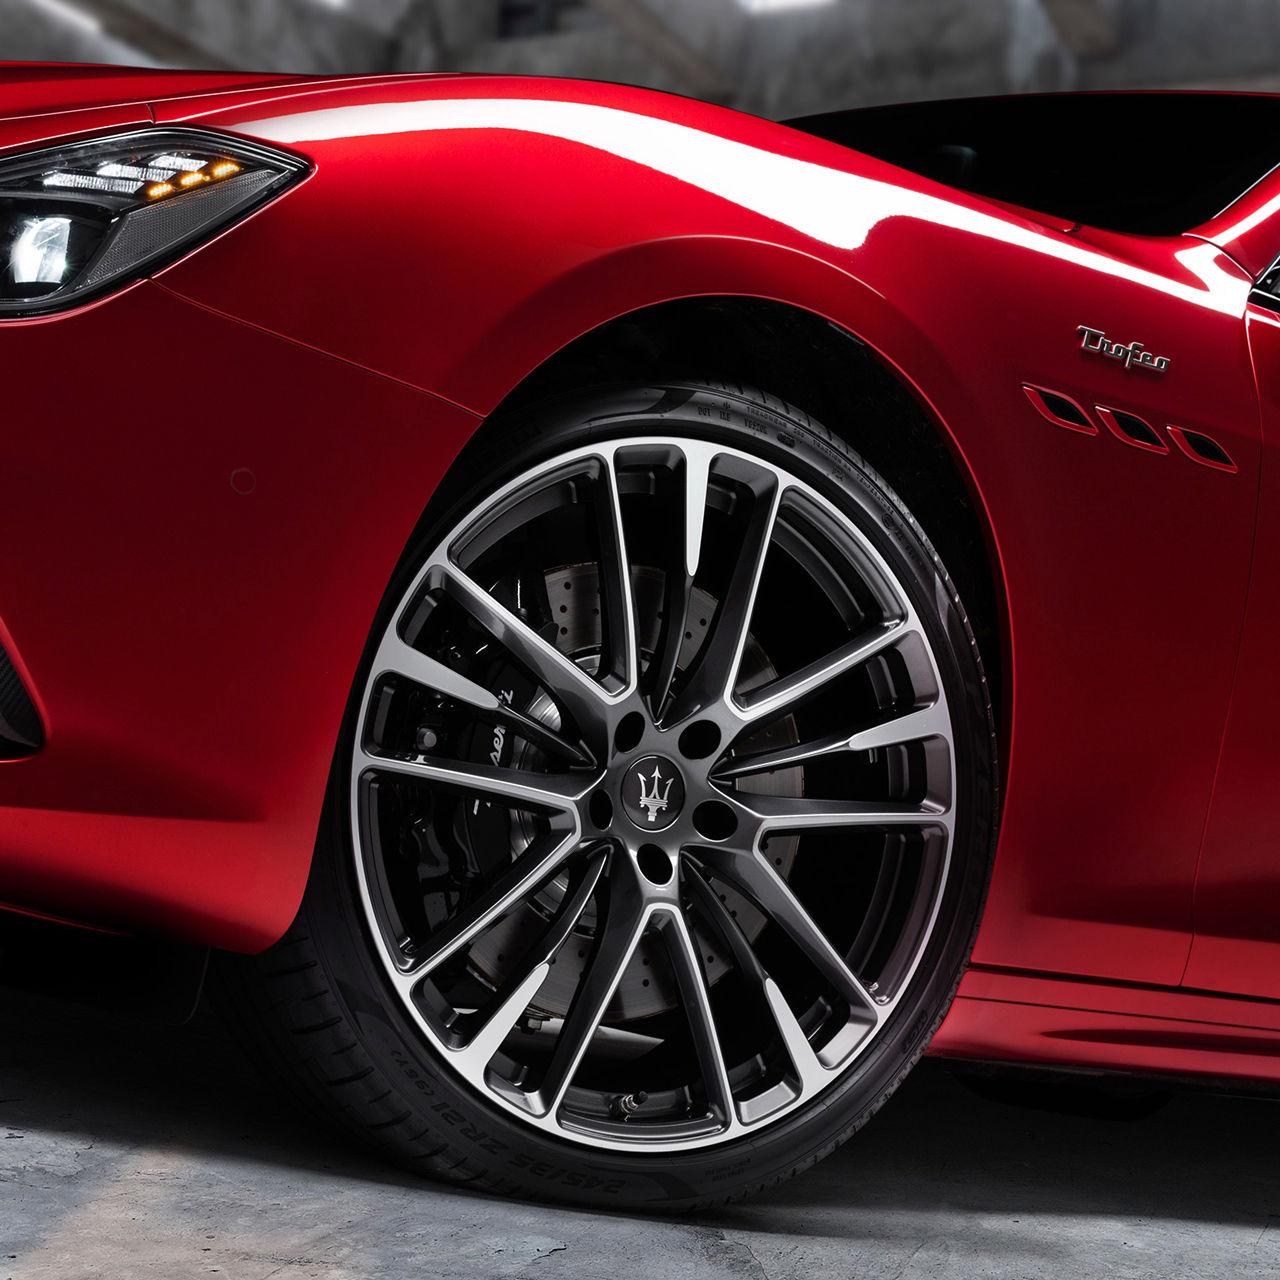 Maserati Ghibli Trofeo - Rot - Rad und Felge